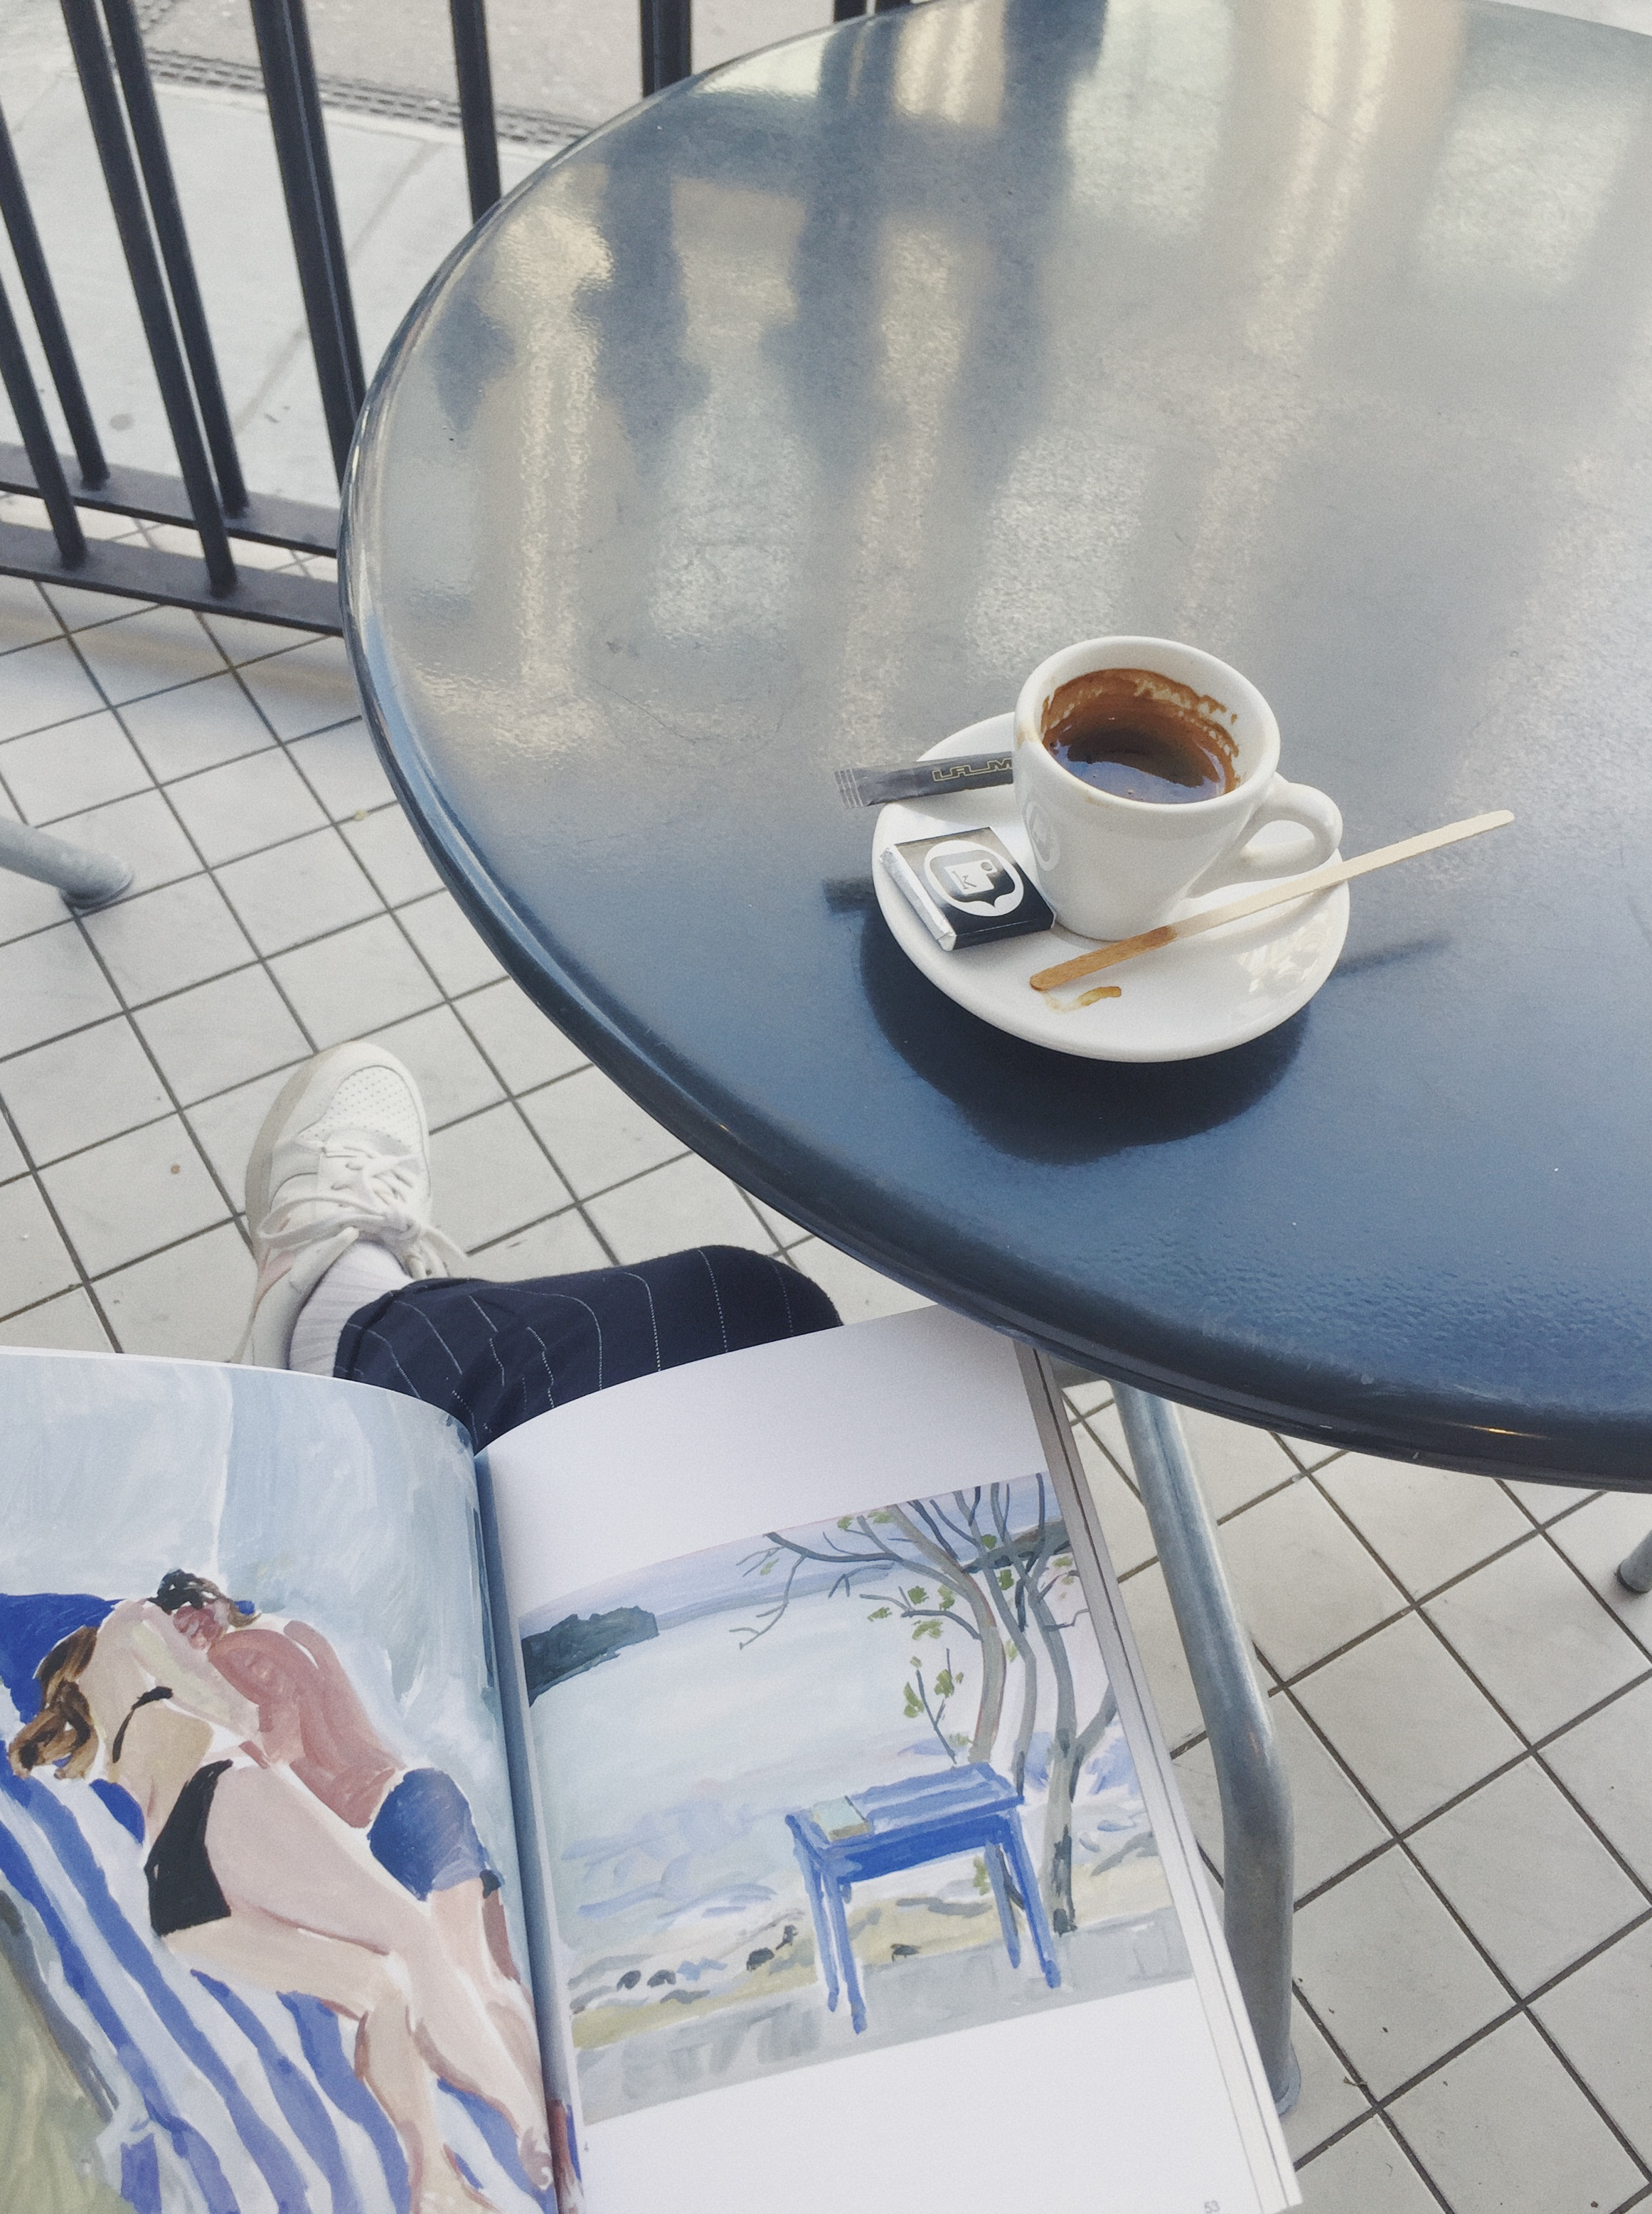 Reading KENNEDY at Kioskafe